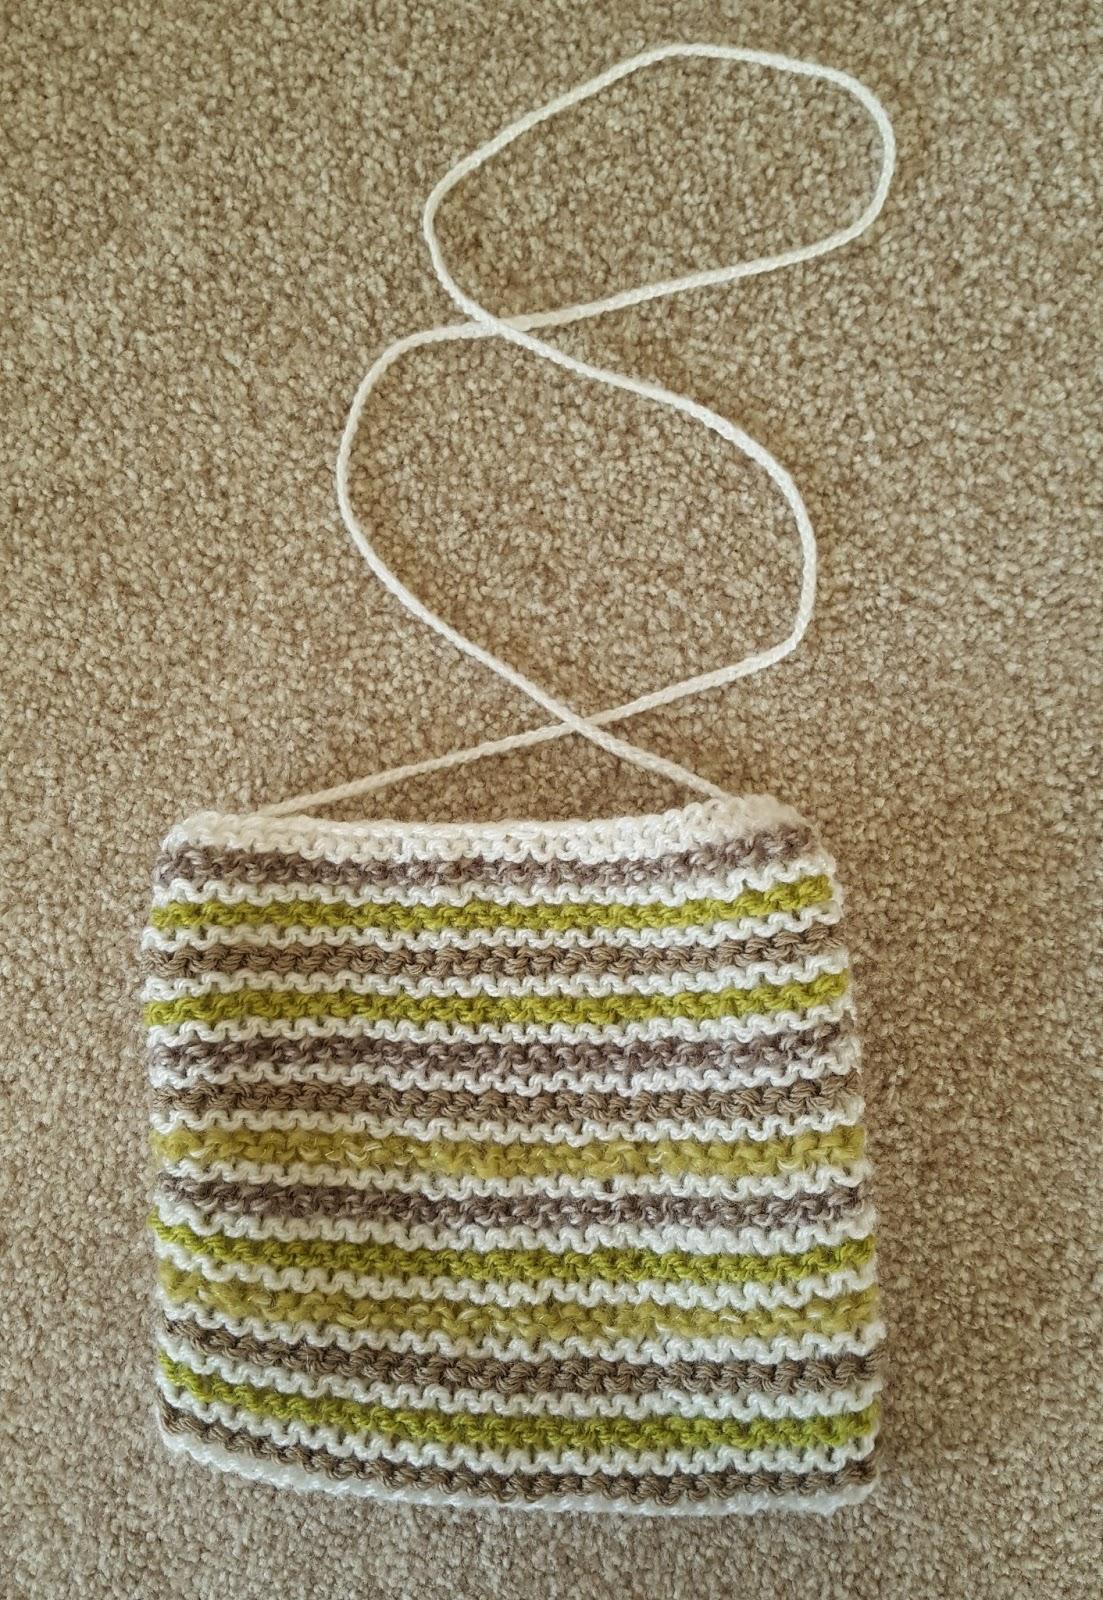 how to make a knitting bag